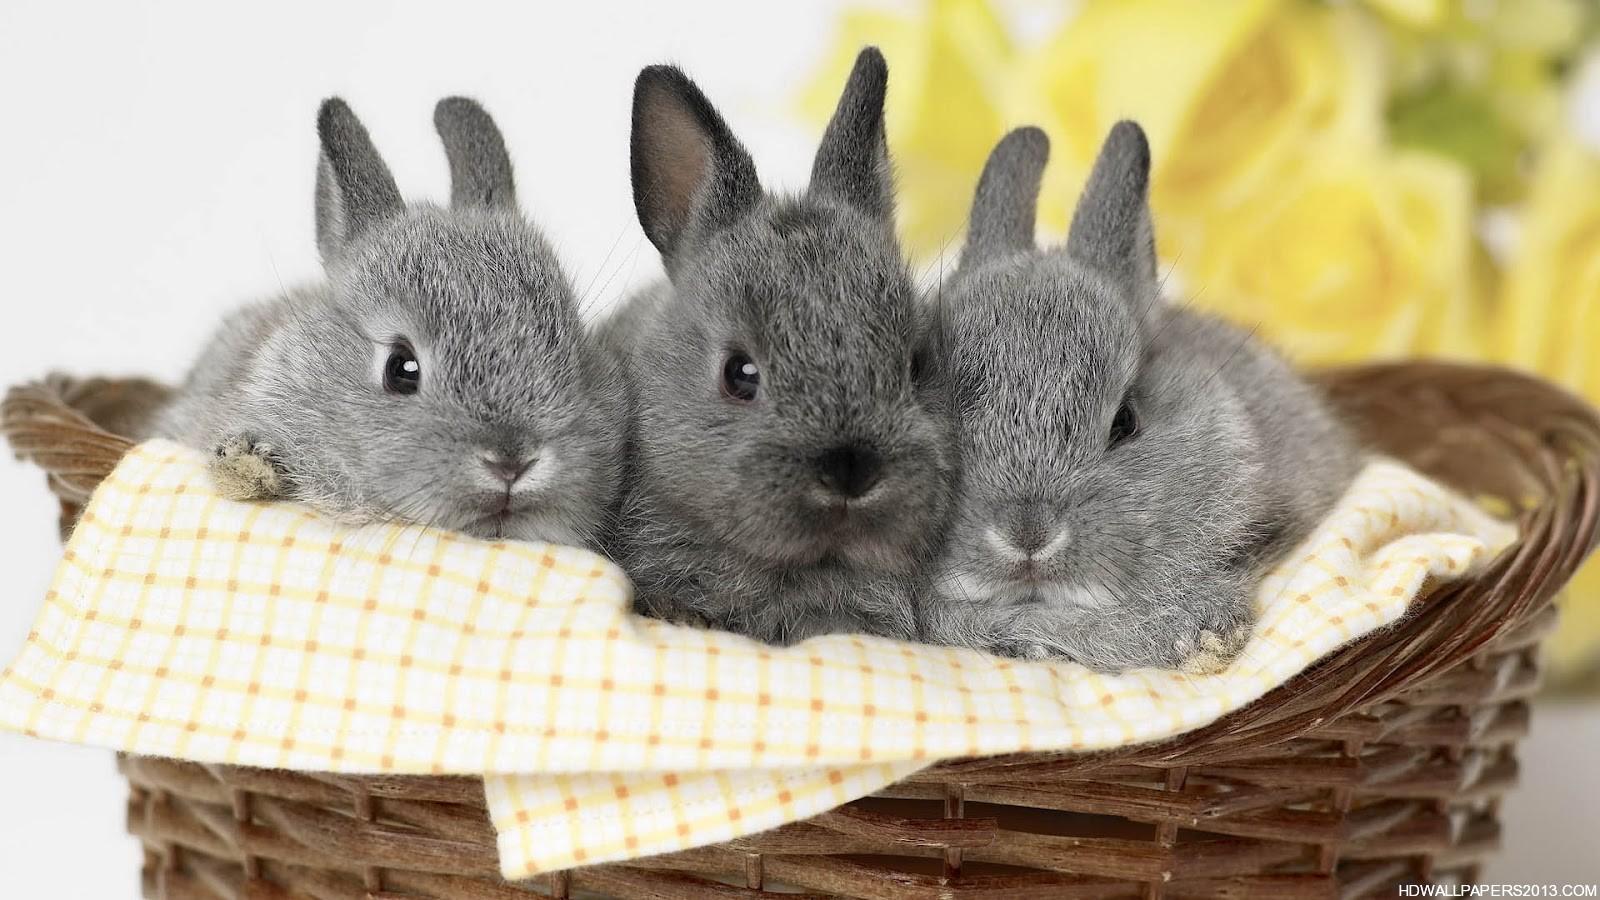 Cute White Rabbit Wallpapers For Desktop: Rabbit Wallpapers For Desktop